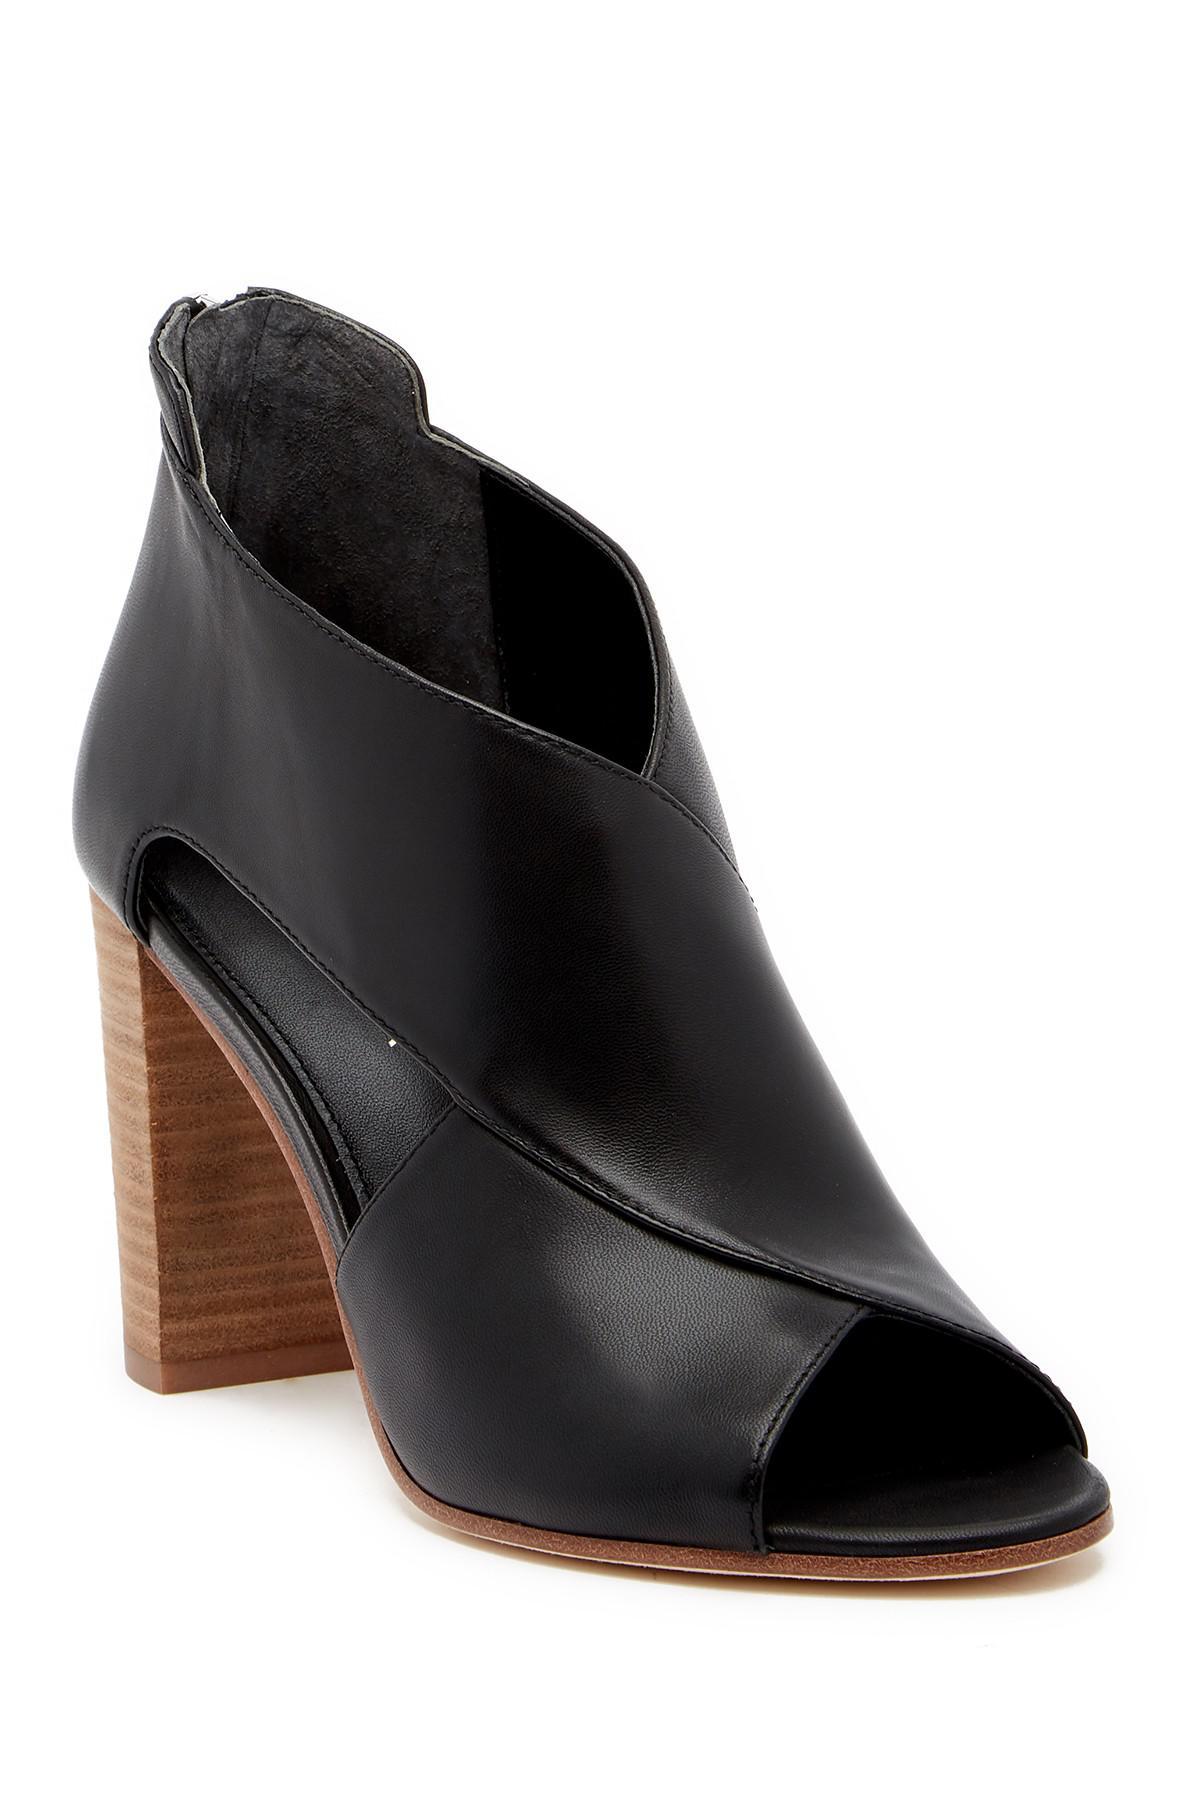 Via Spiga Gerri Block Heel Sandal IJ4A9Rp275